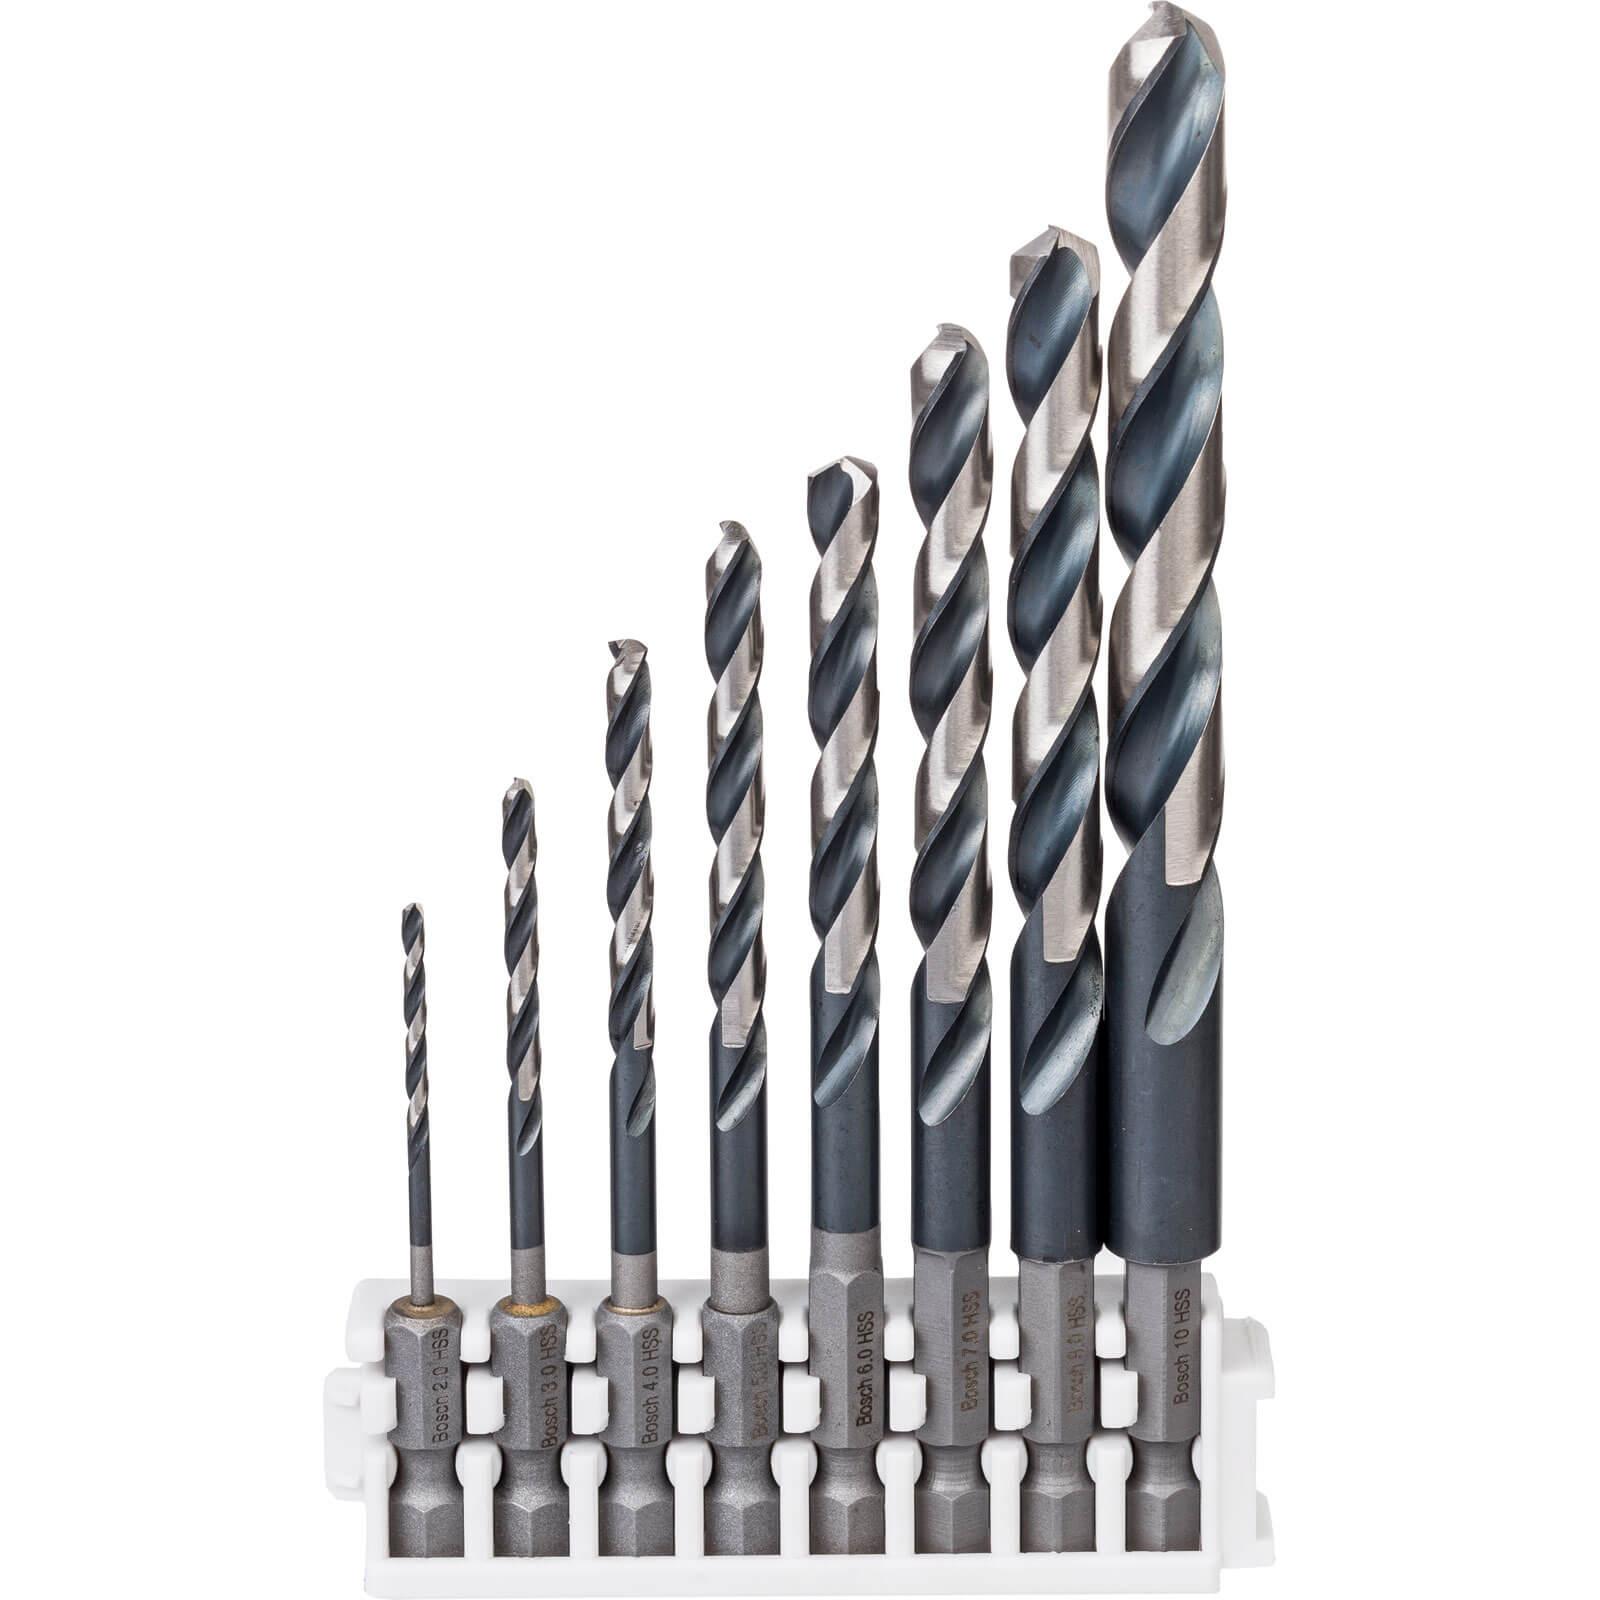 Sirius Professional HSS Jobber Drill Bit 9.75mm